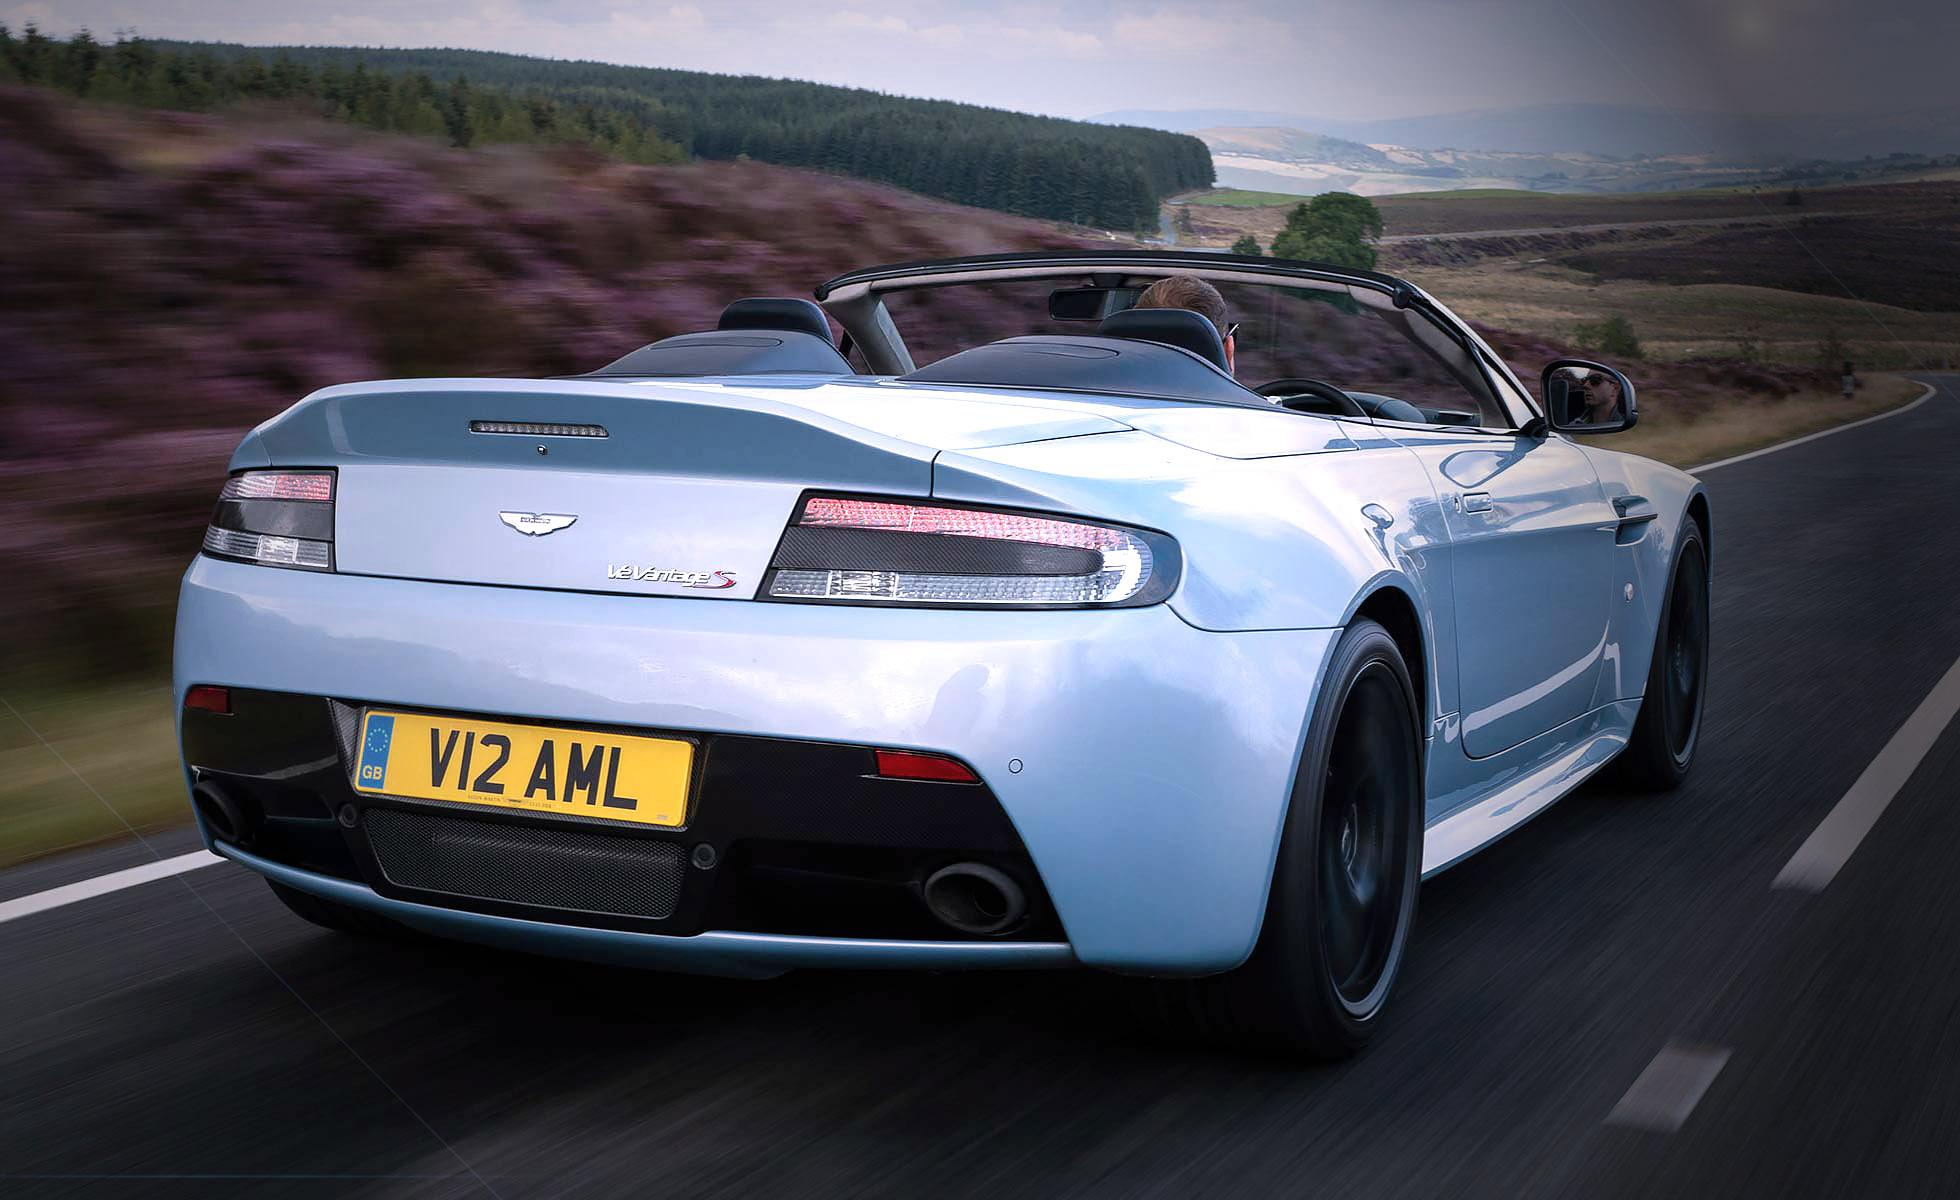 2015 - Aston Martin V12 Vantage S Roadster